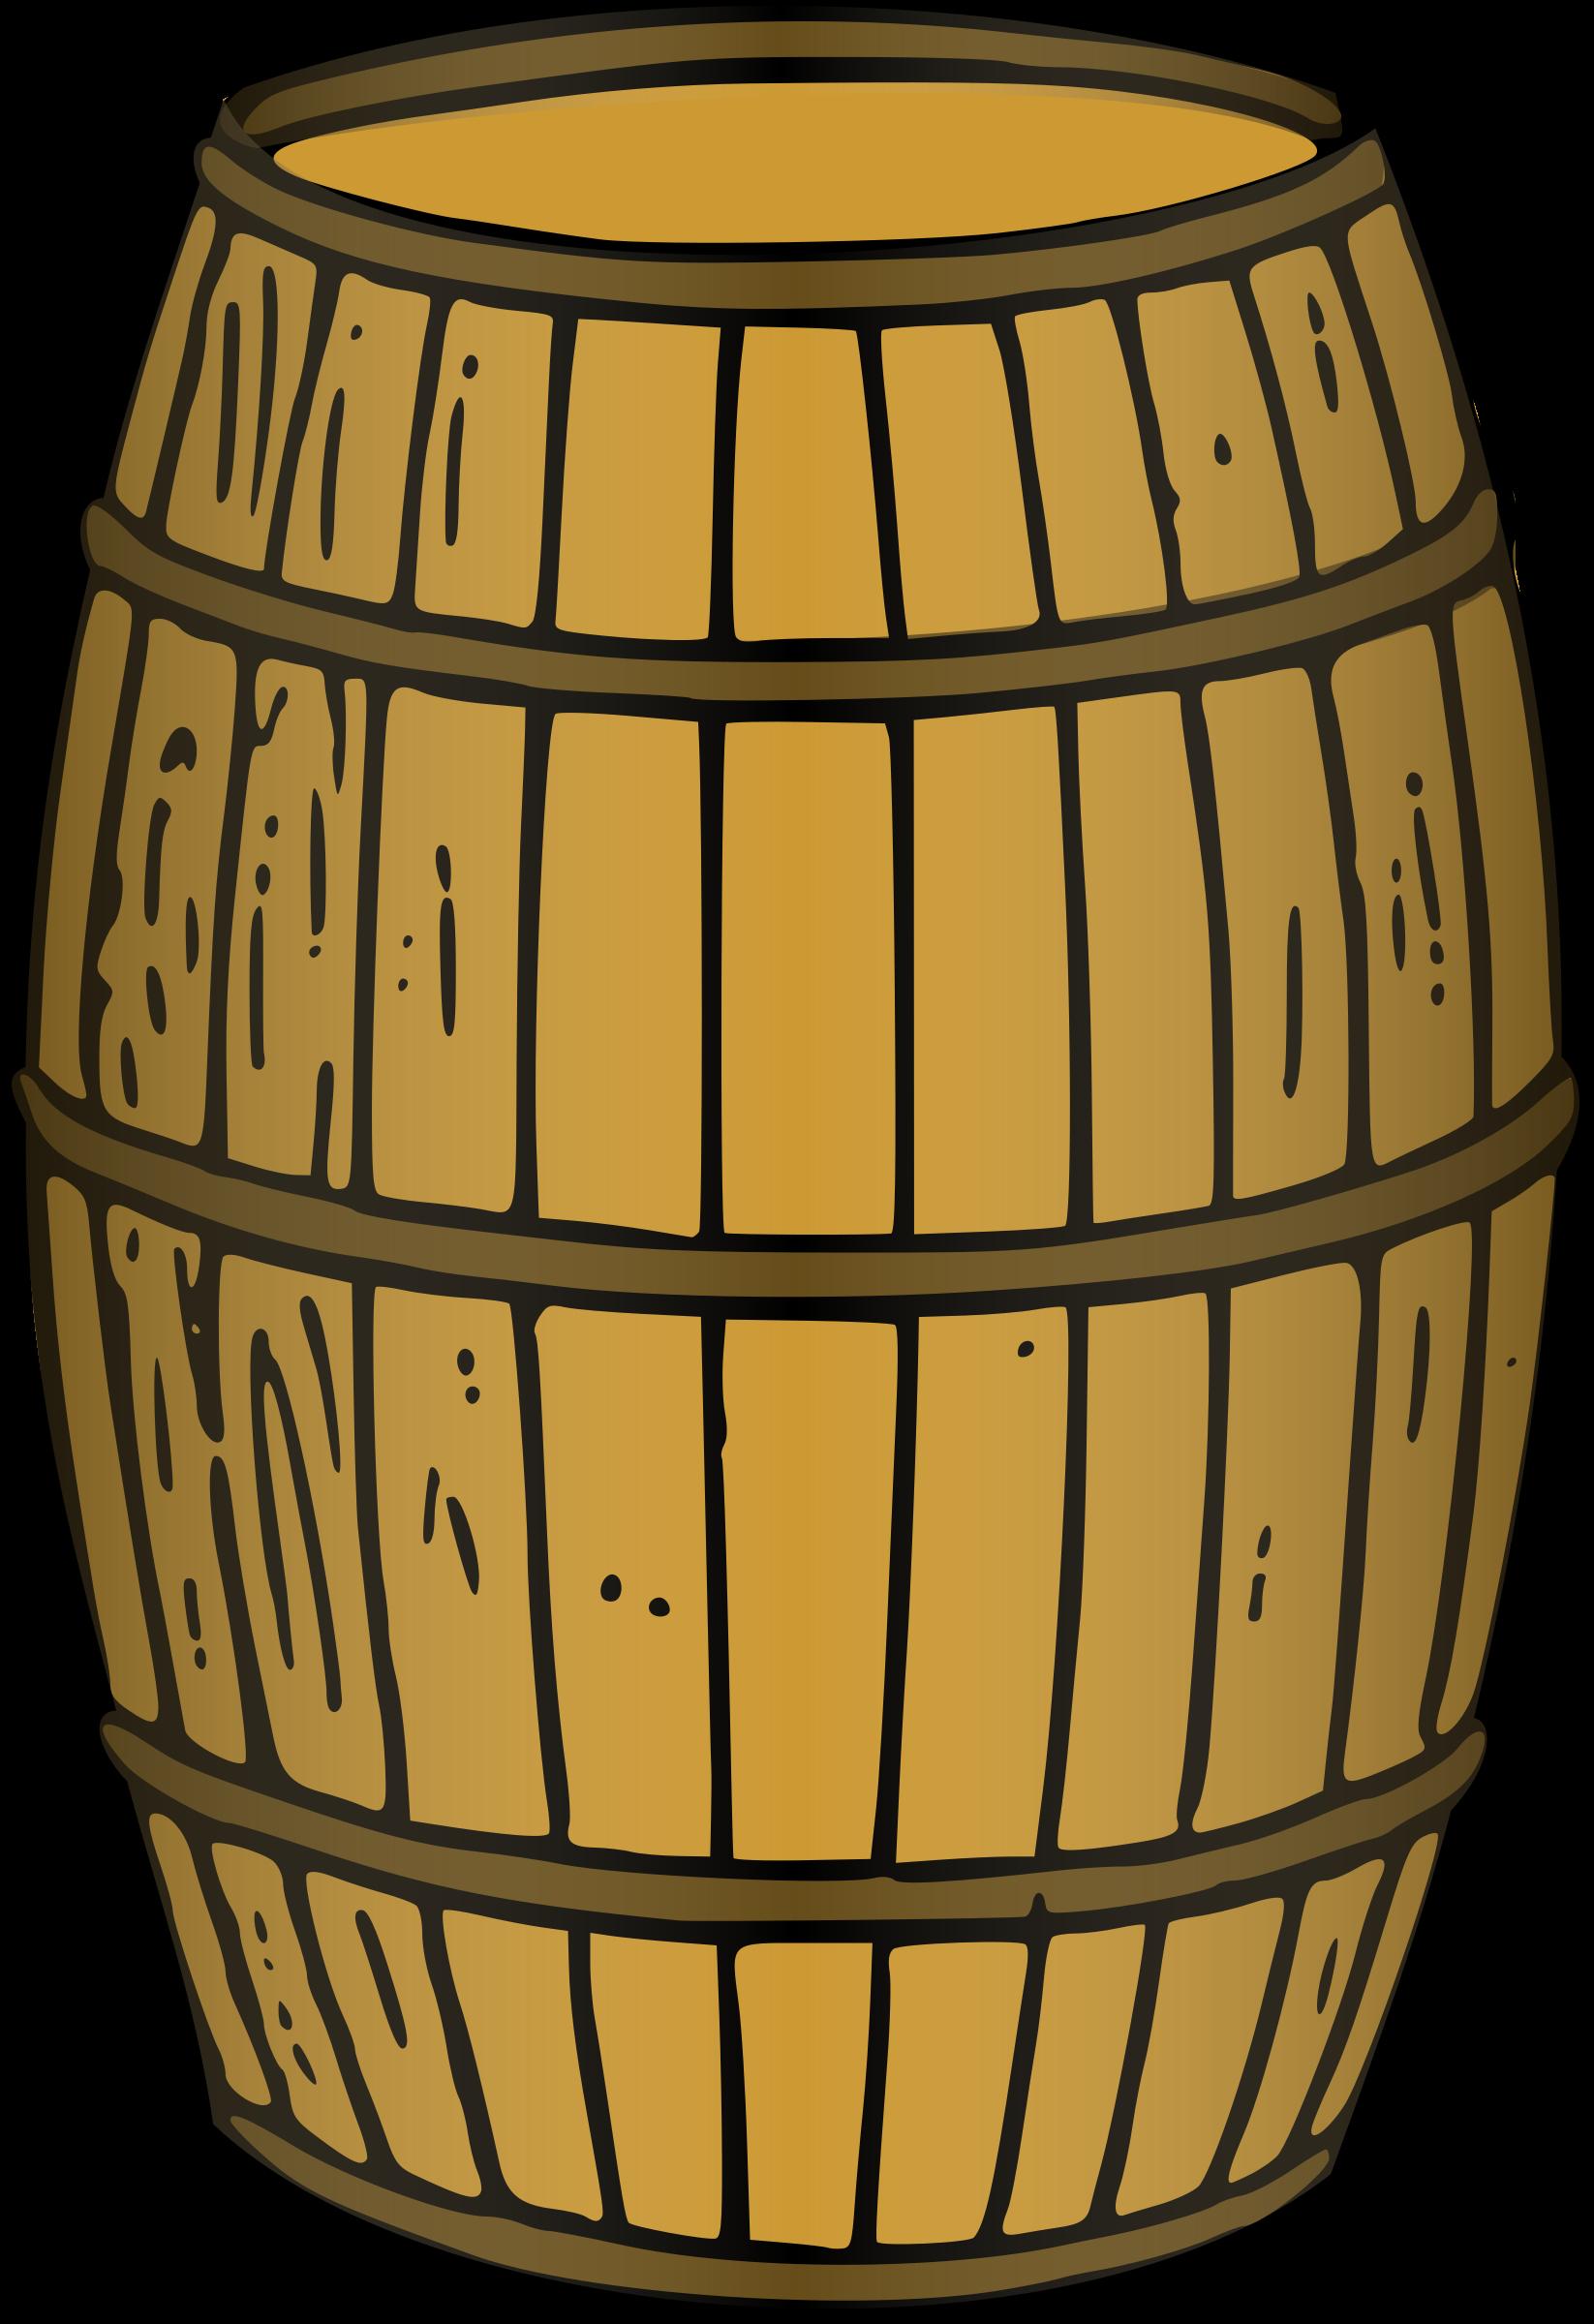 Apple barrel clipart transparent Barrel clipart transparent background FREE for download on rpelm transparent